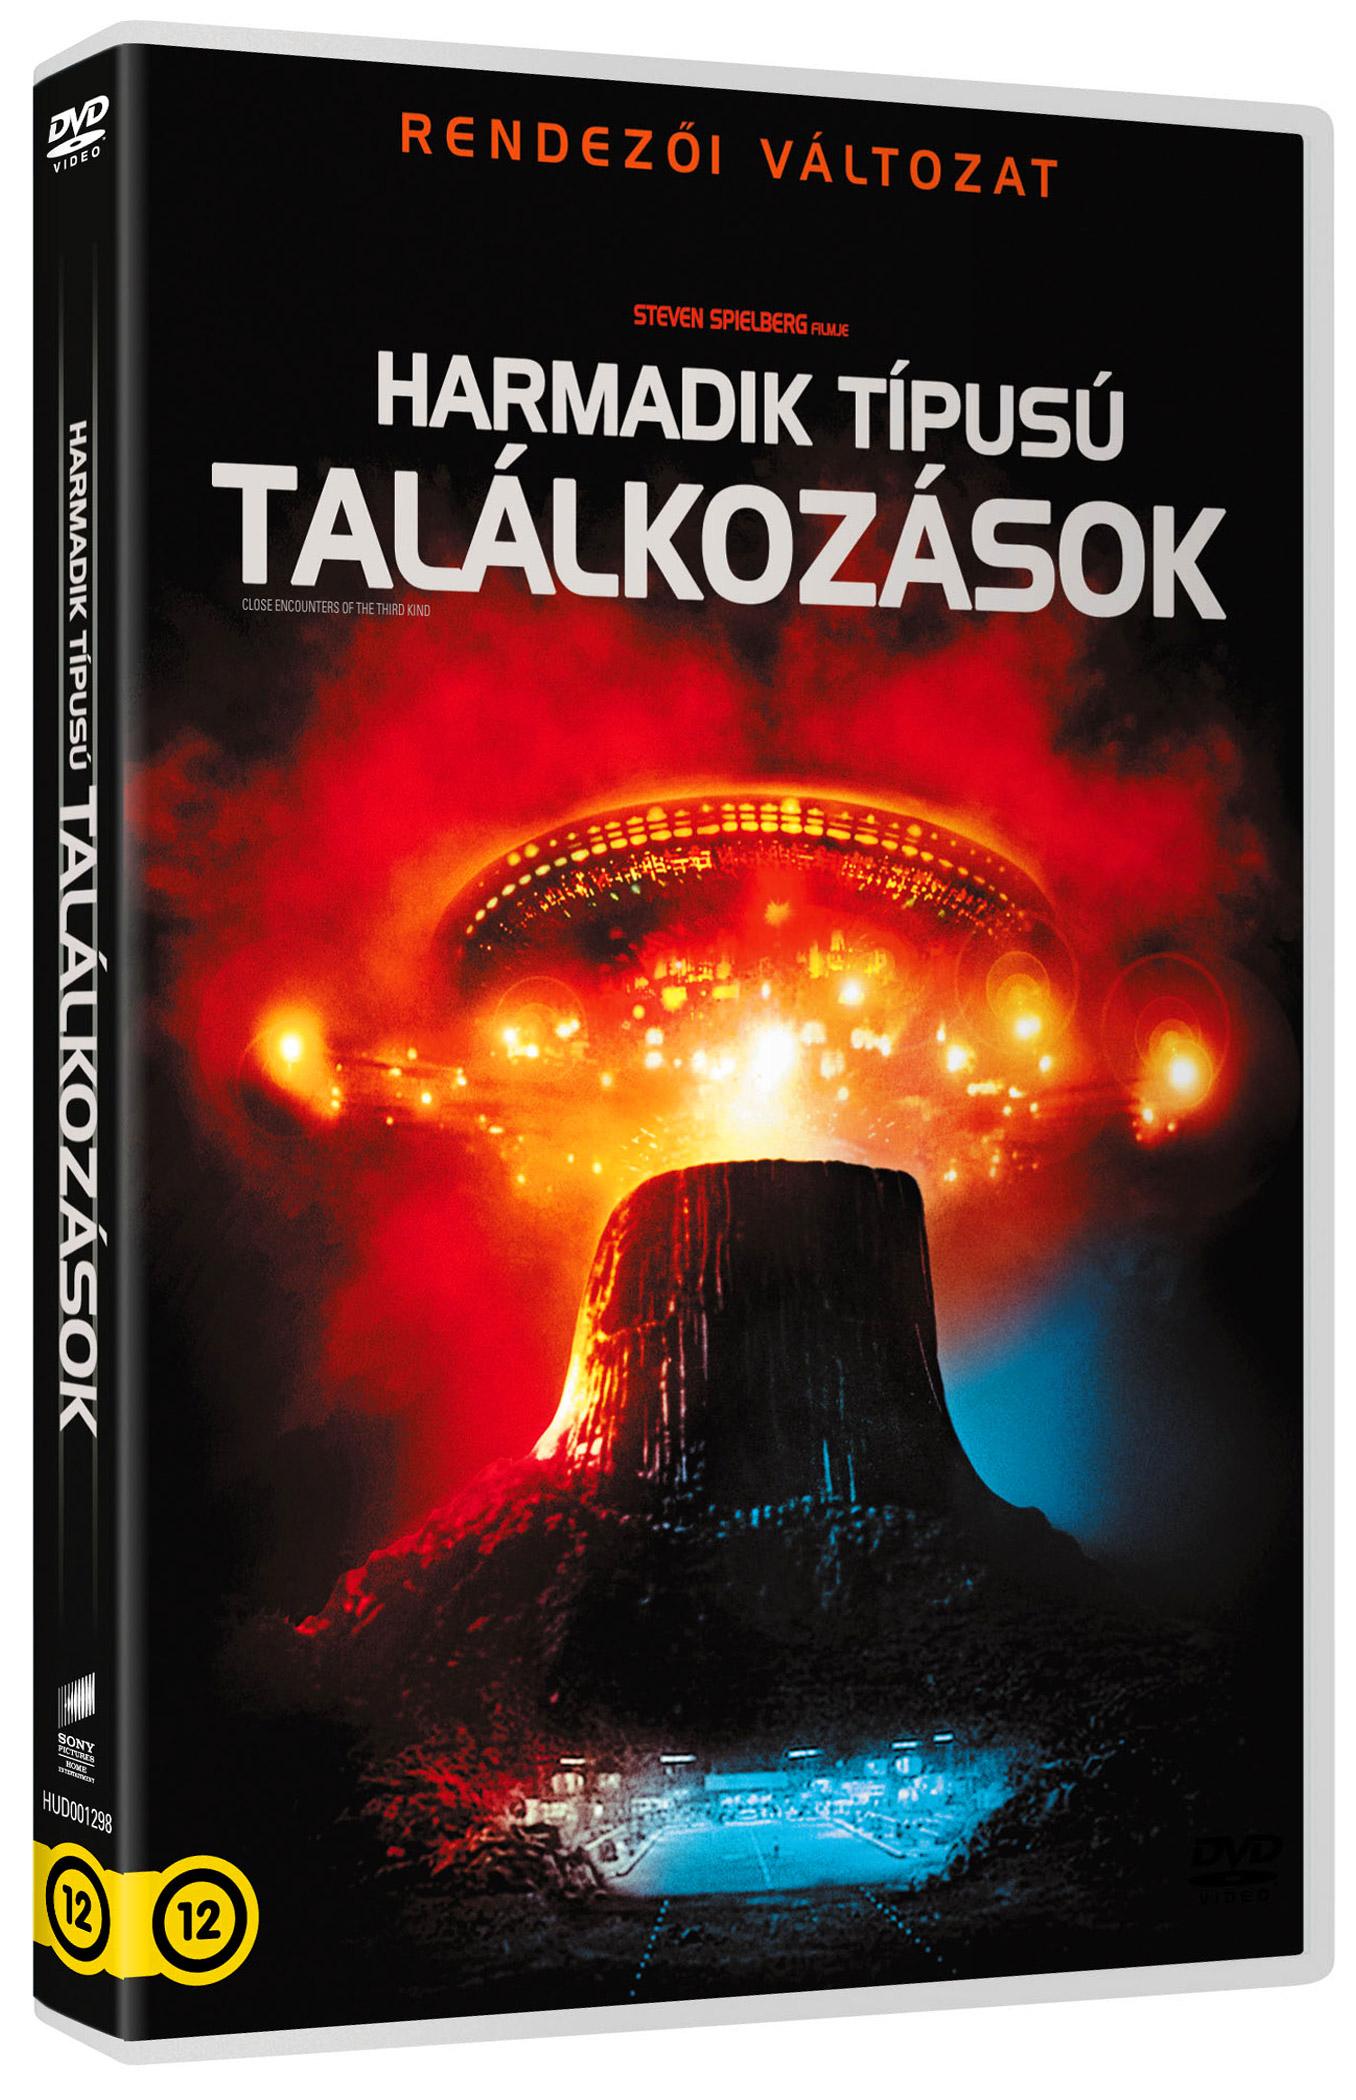 Harmadik tipus� tal�lkoz�sok DVD